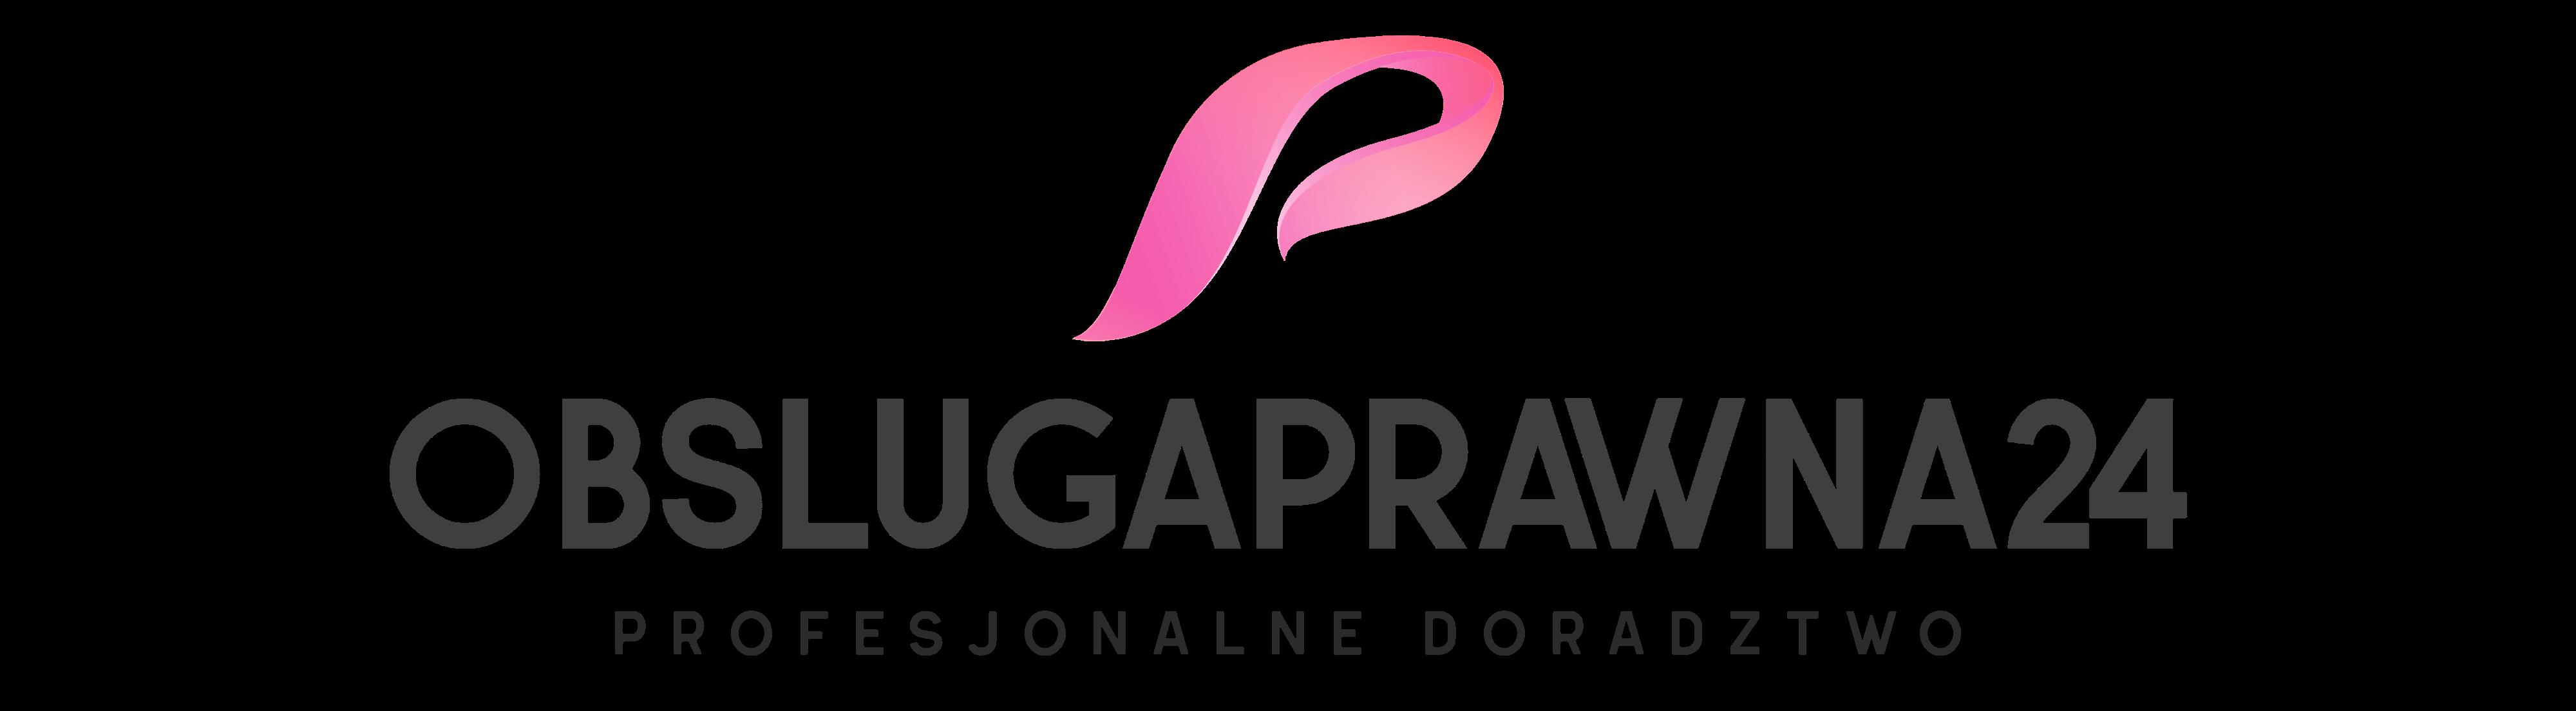 obslugaprawna24